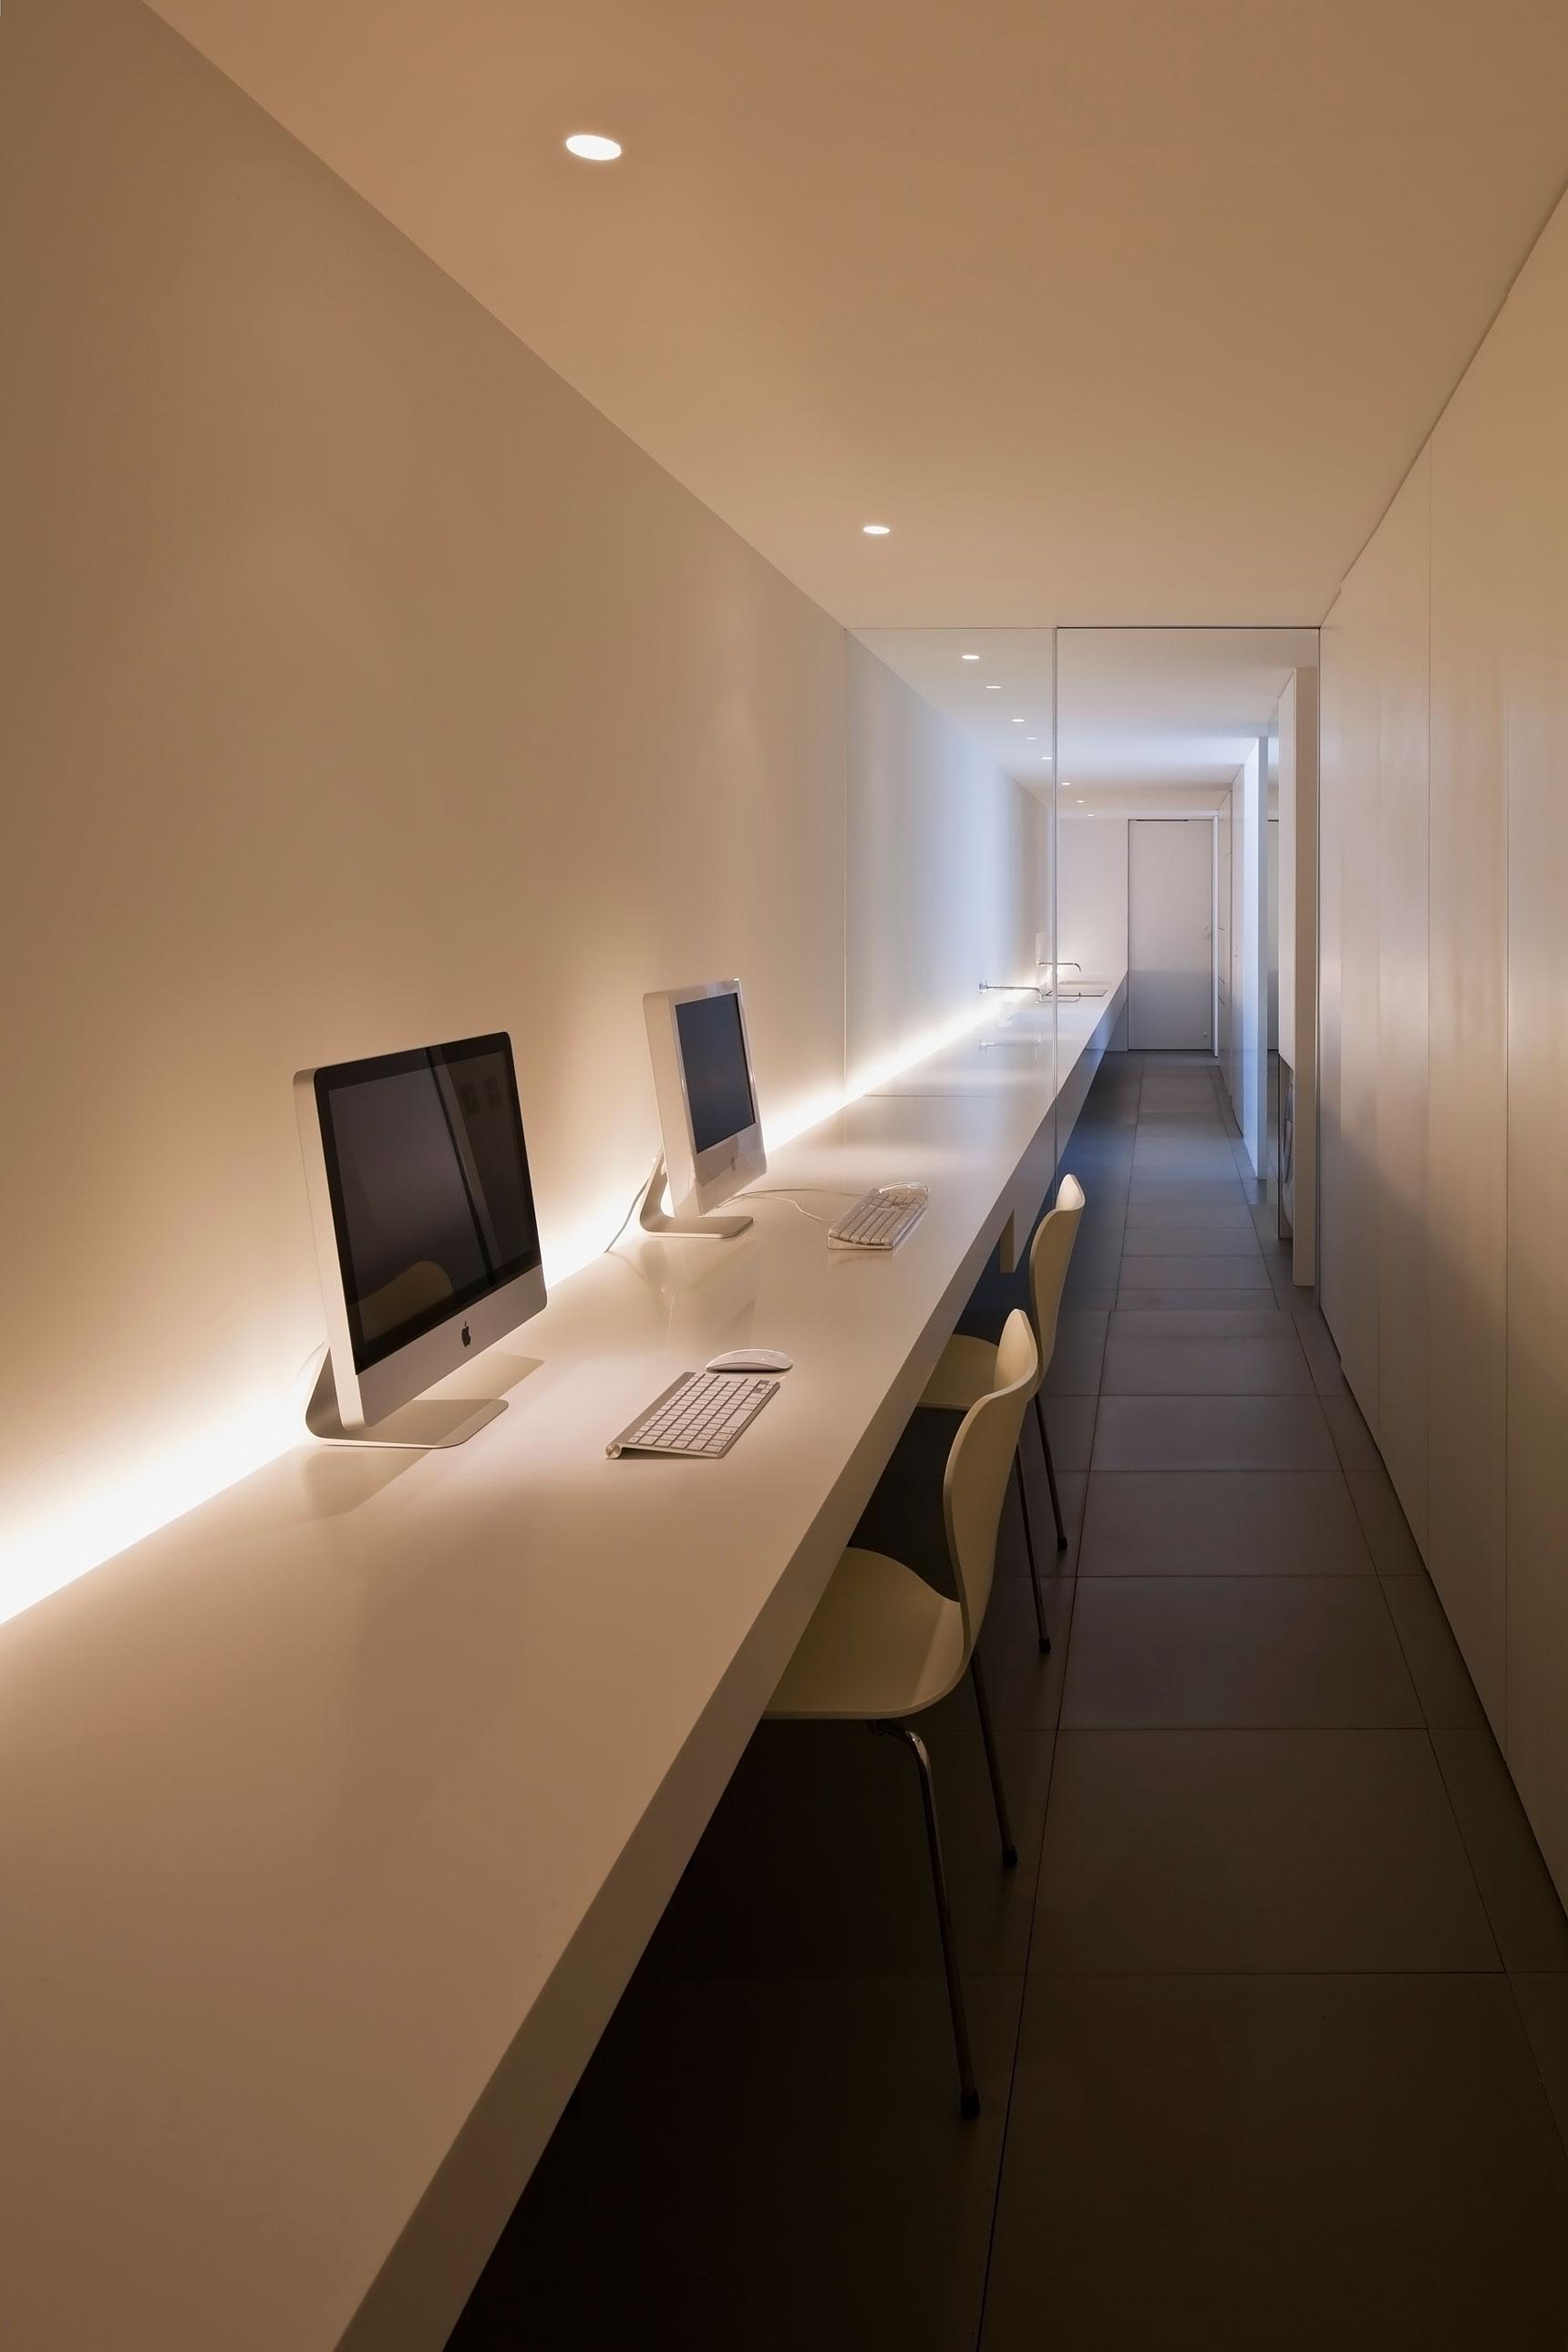 Minimalis House minimalist house | 小川晋一都市建築設計事務所